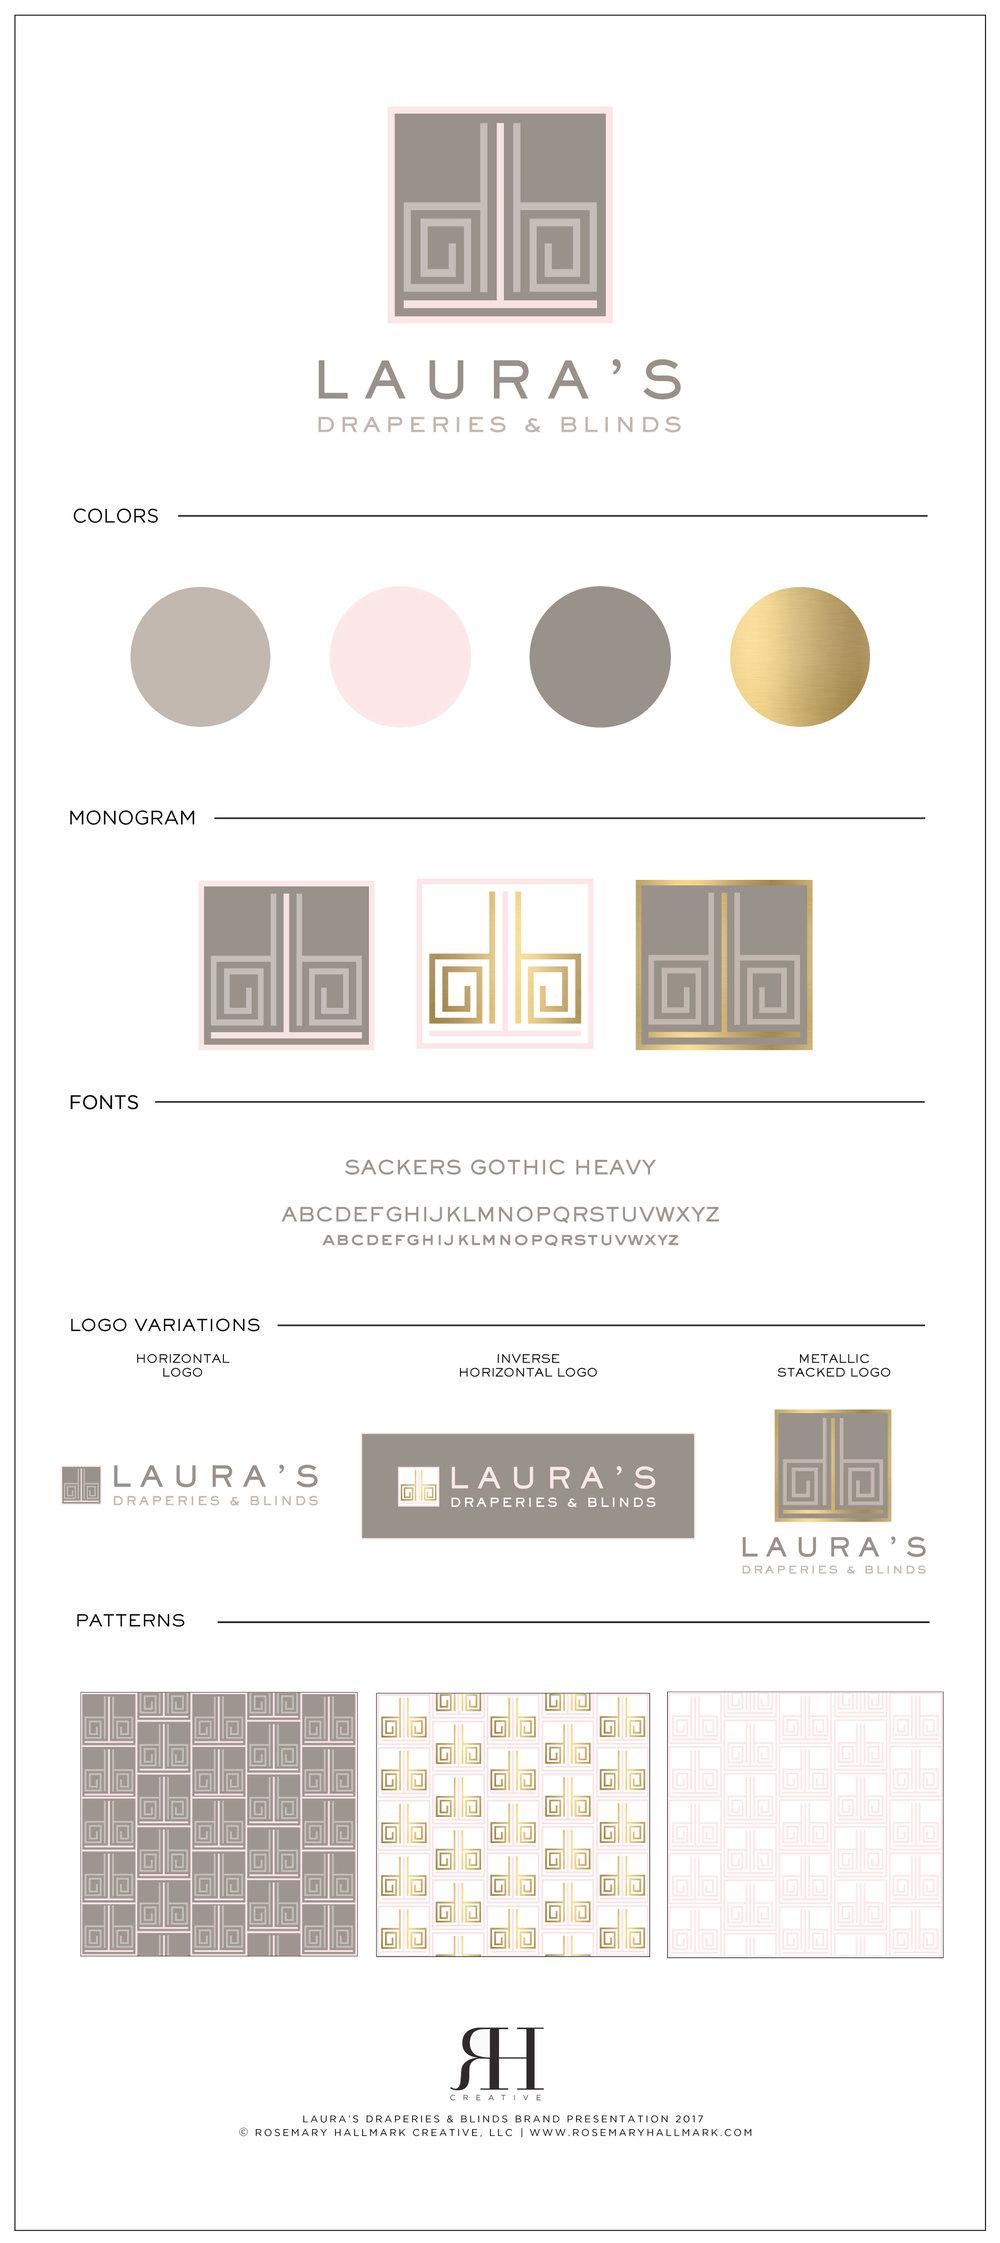 Laura's-Draperies-and-Blinds---Rosemary-Hallmark-Creative---Brand-Identity.jpg